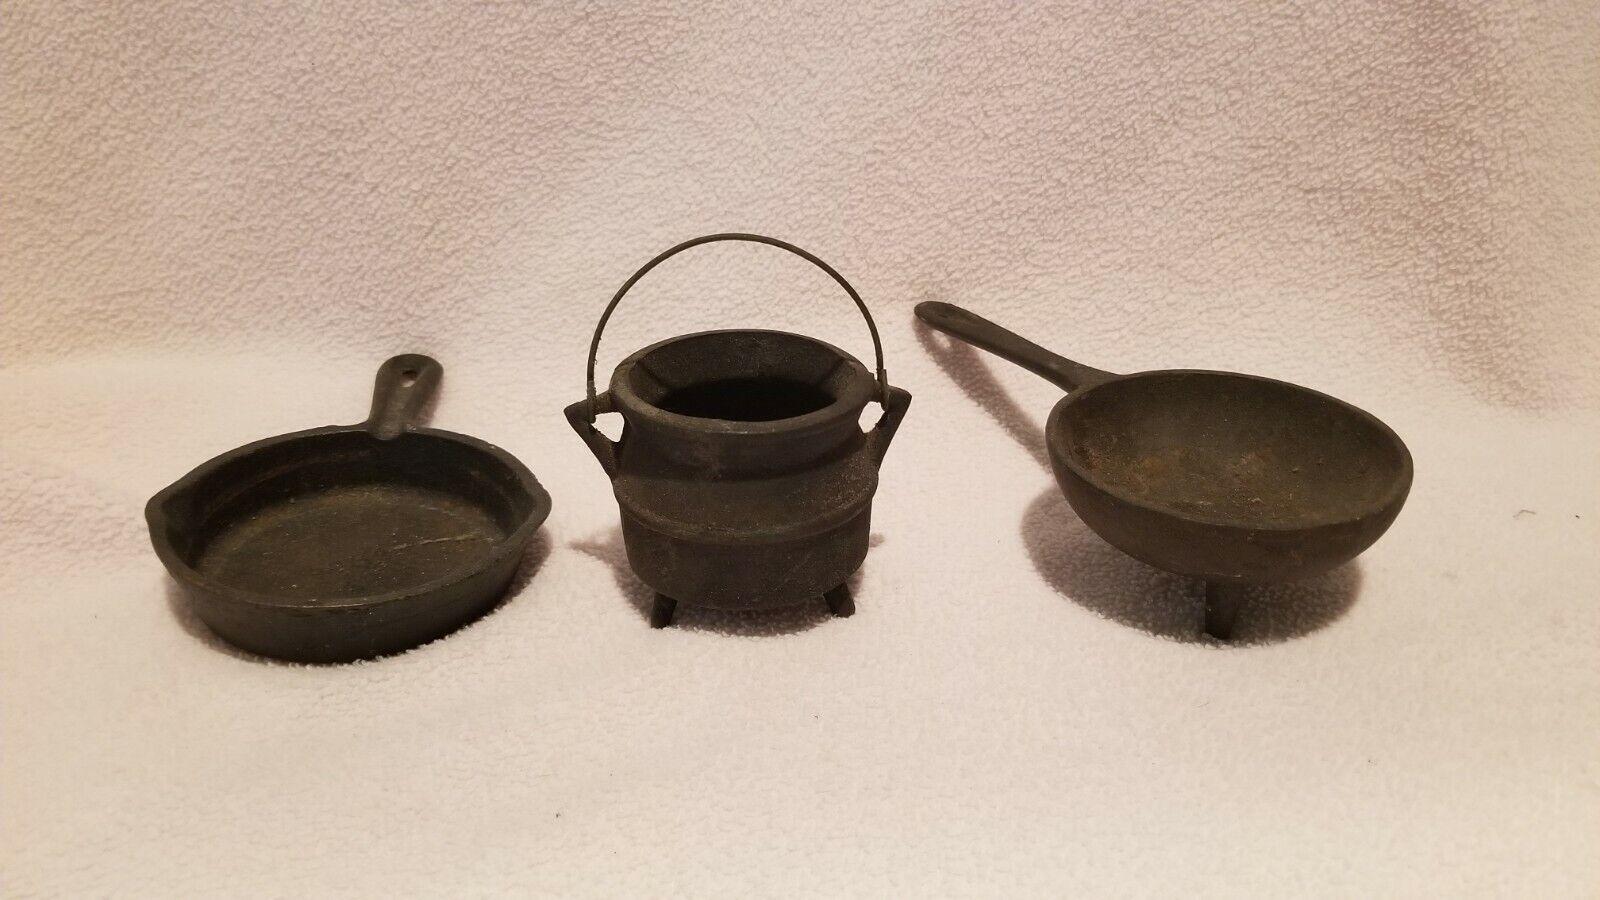 Vintage MIni Cast Iron Pot, Frying Pan and Spider Pan Salesman Samples